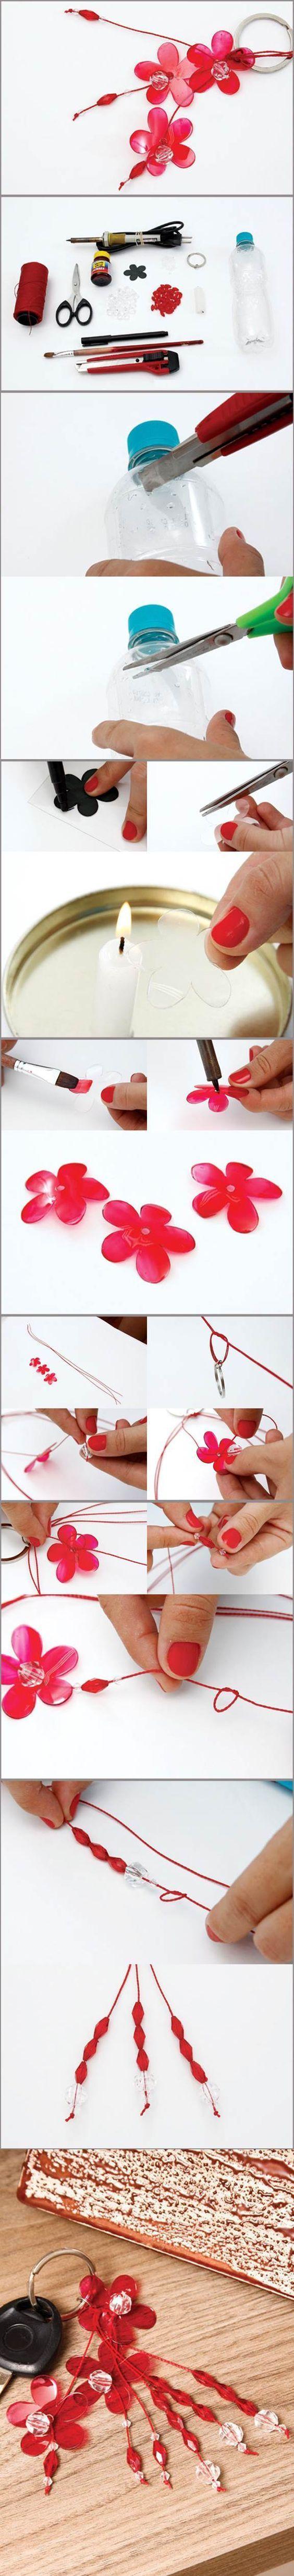 DIY Flower Key Chains from Plastic Bottle | iCreativeIdeas.com Like Us on Facebook ==> https://www.facebook.com/icreativeideas